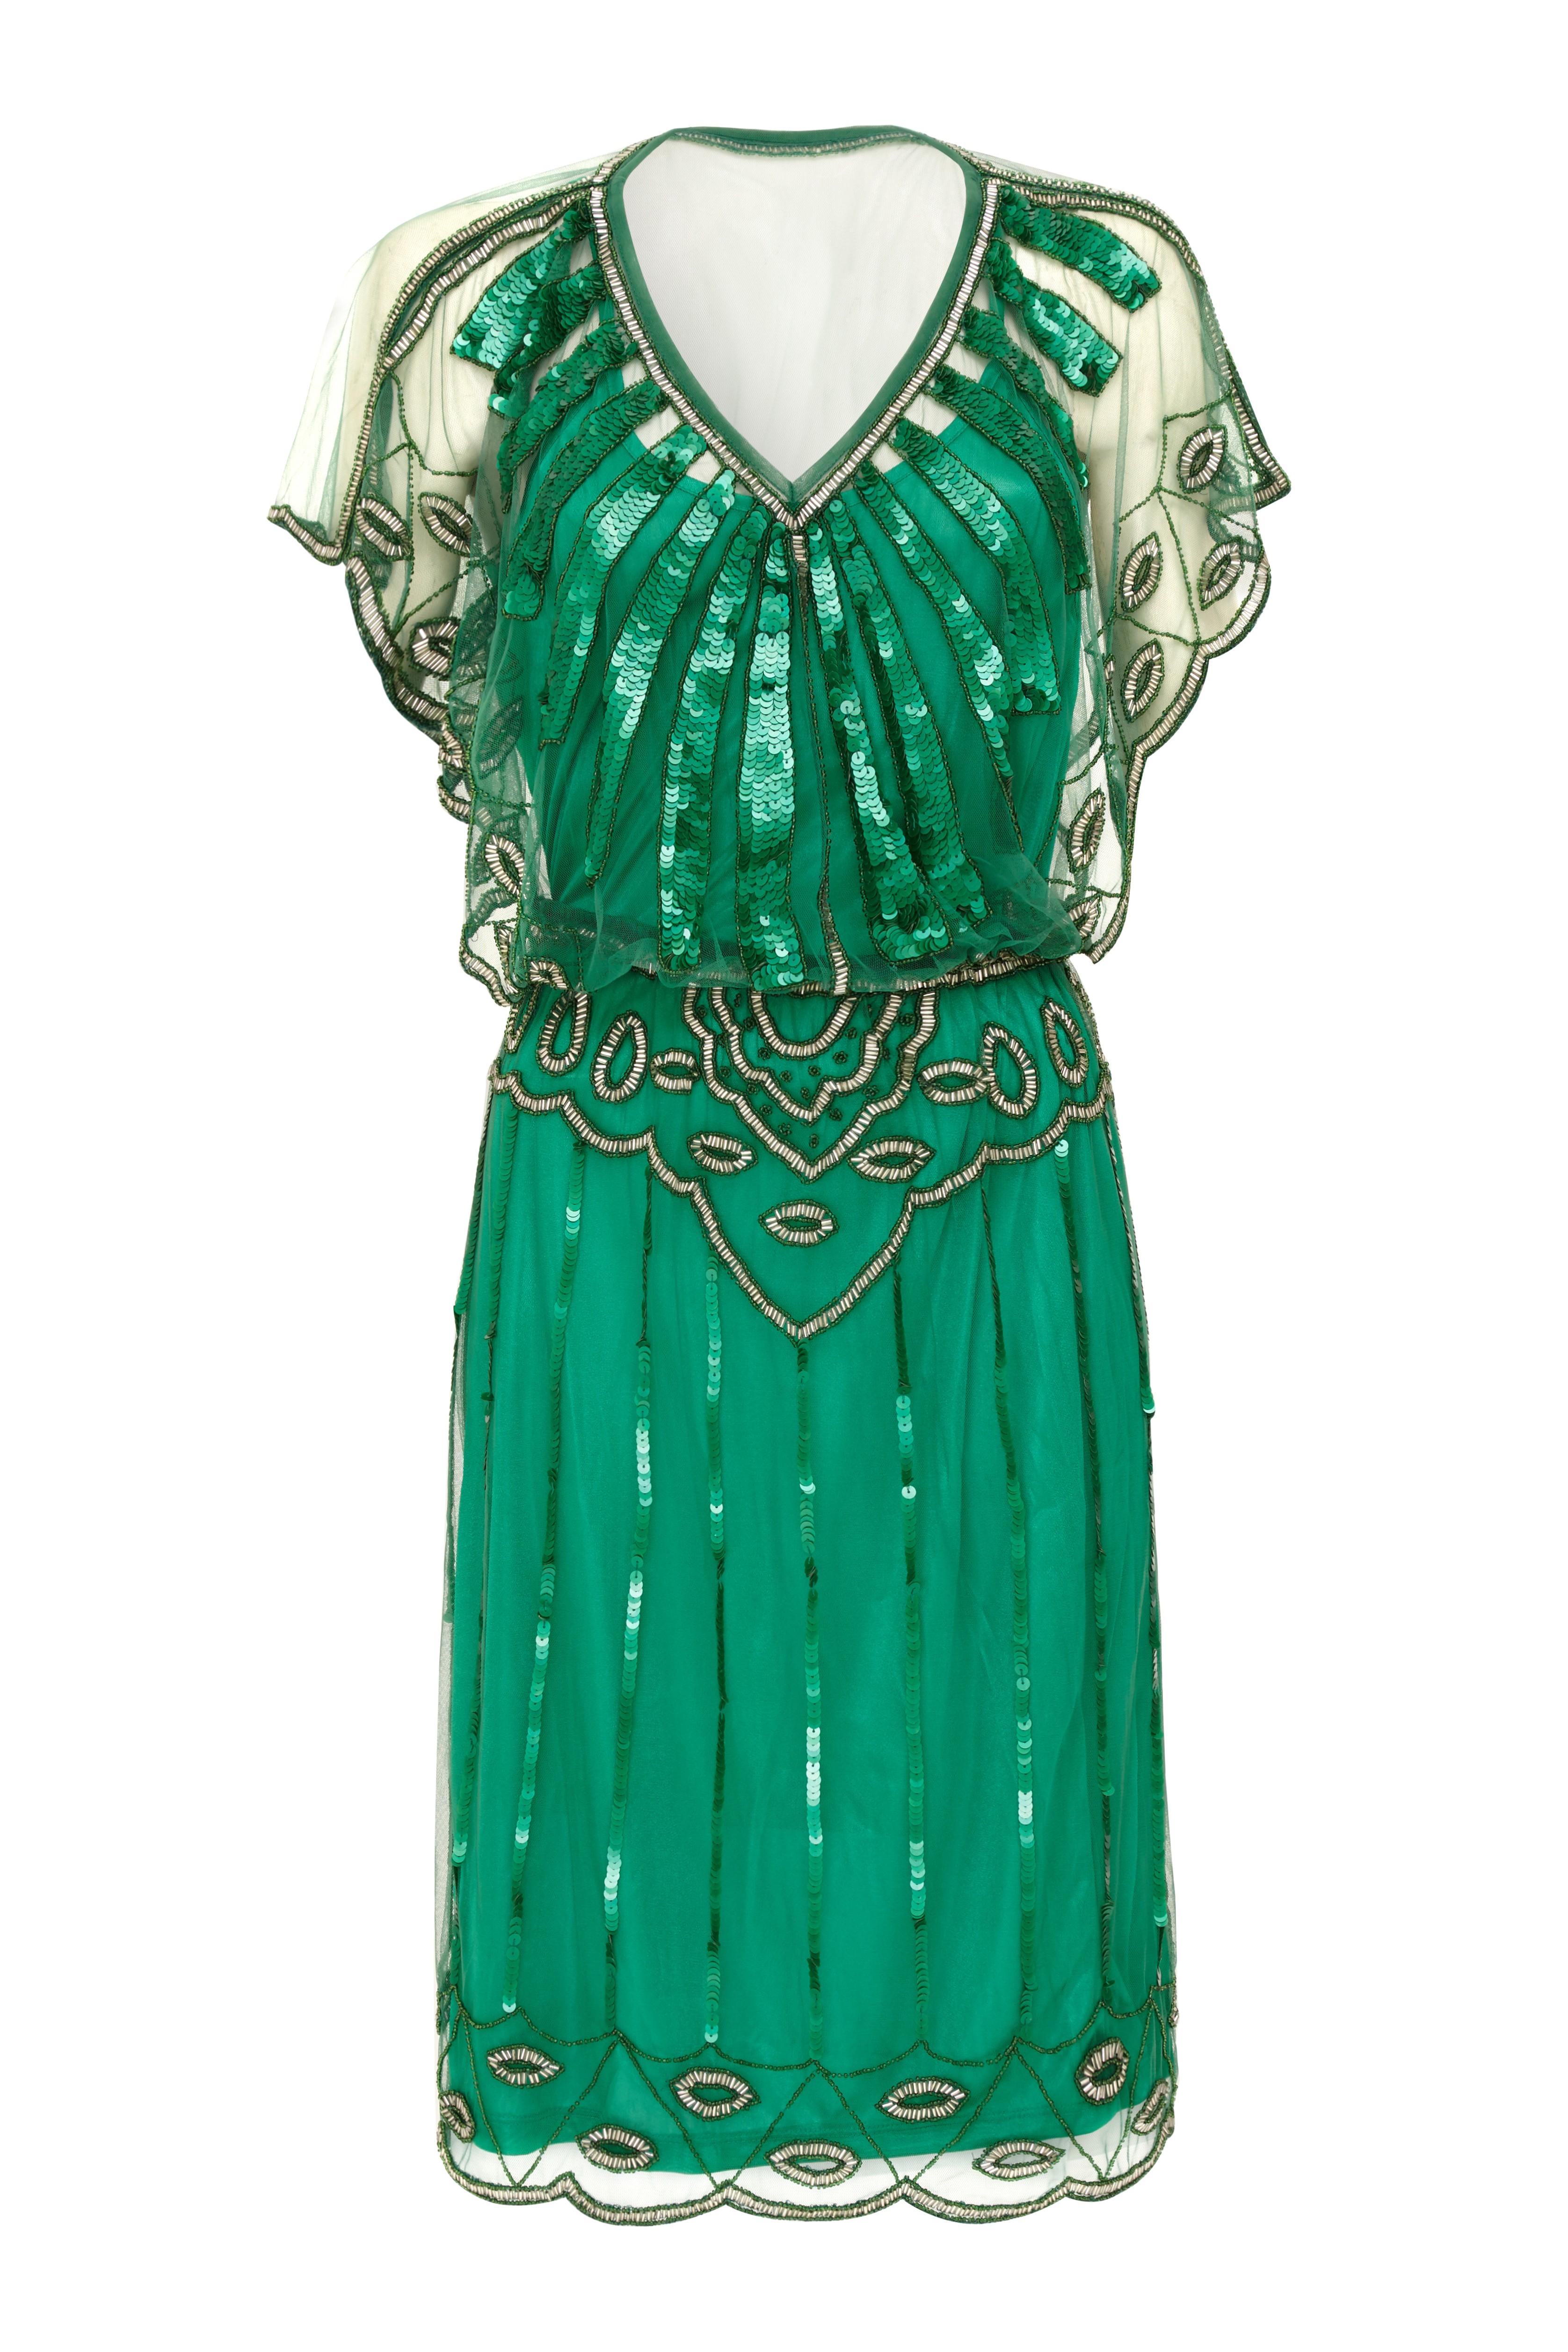 Angel Sleeve 1920\'s Vintage Inspired Flapper Dress in Emerald Green